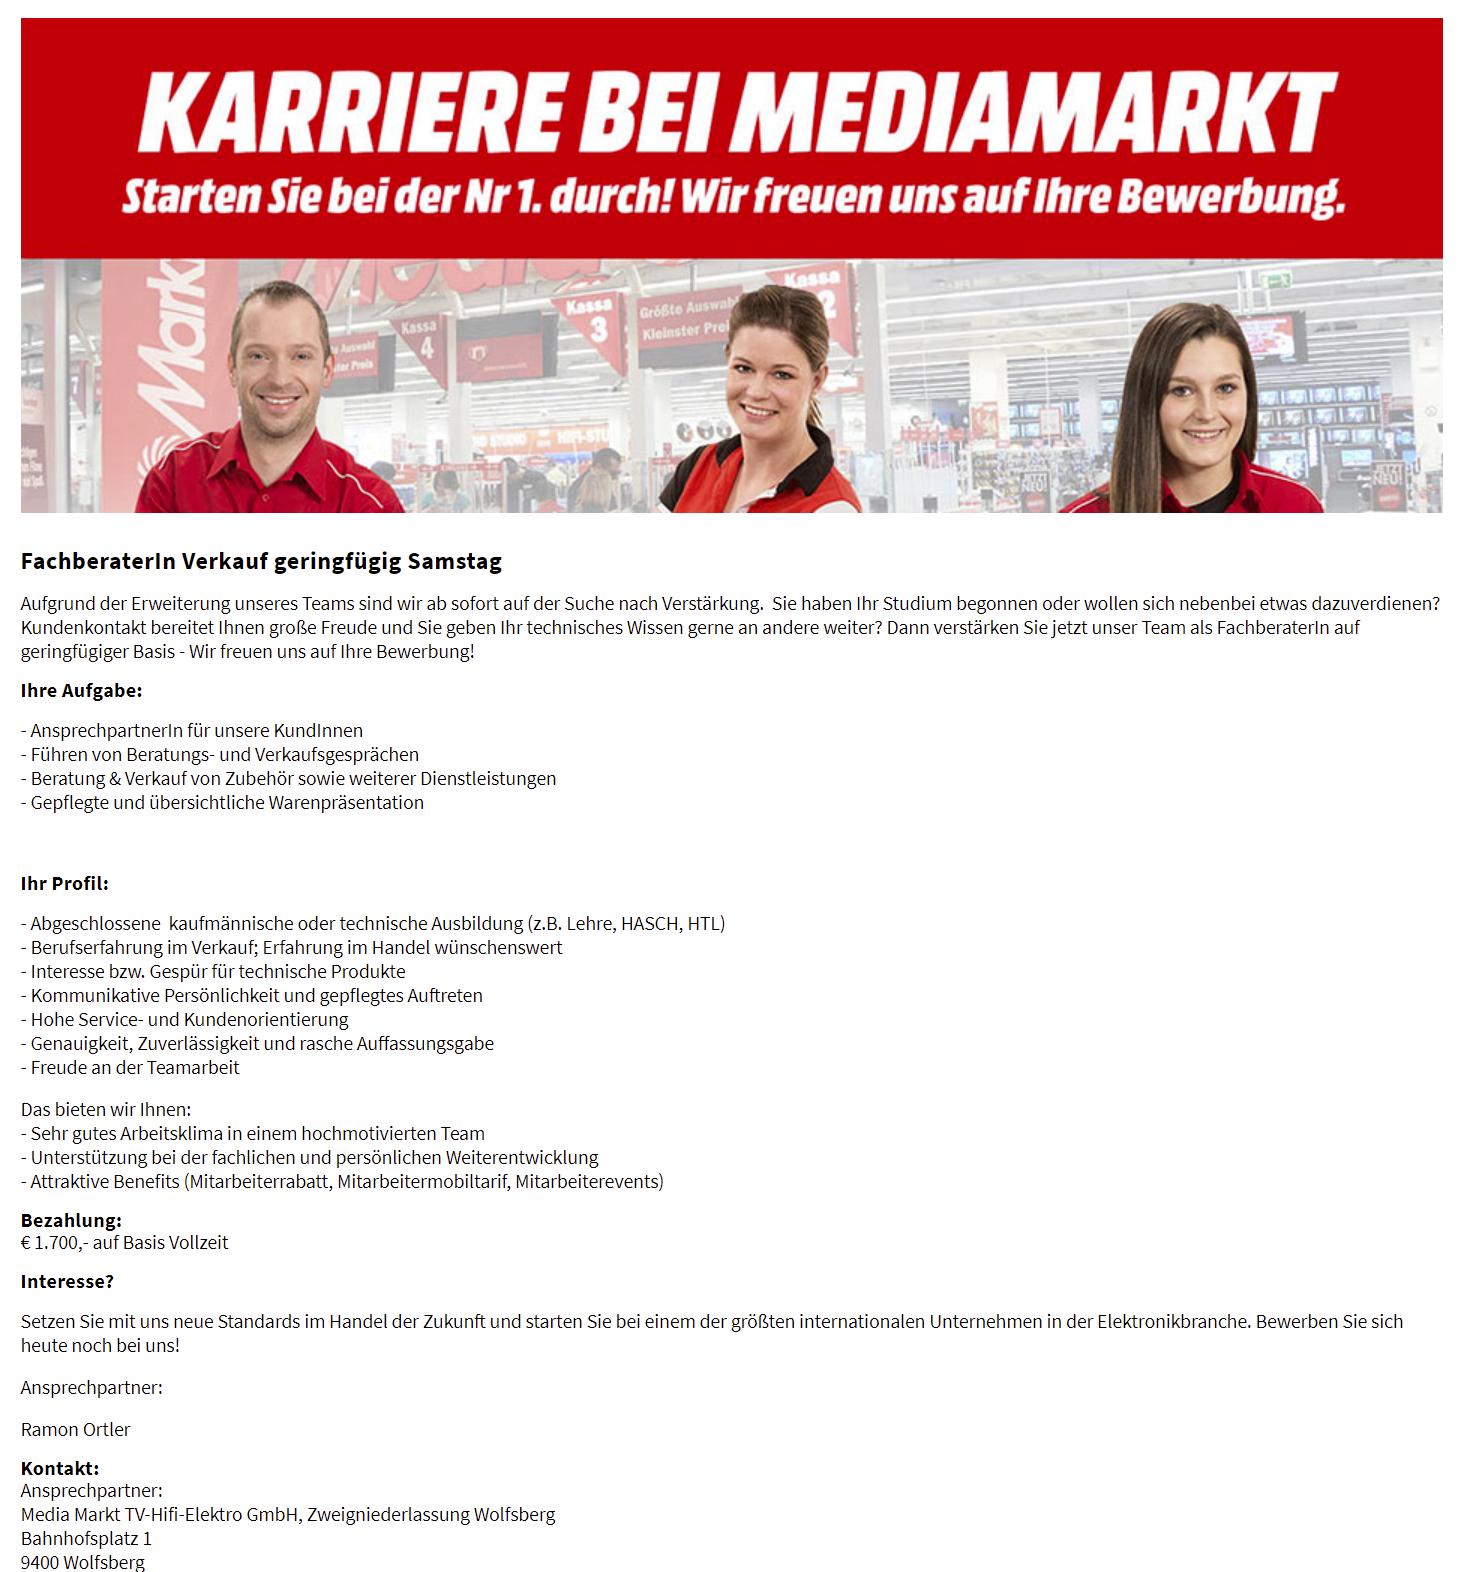 Samstag Aushilfe Media Markt